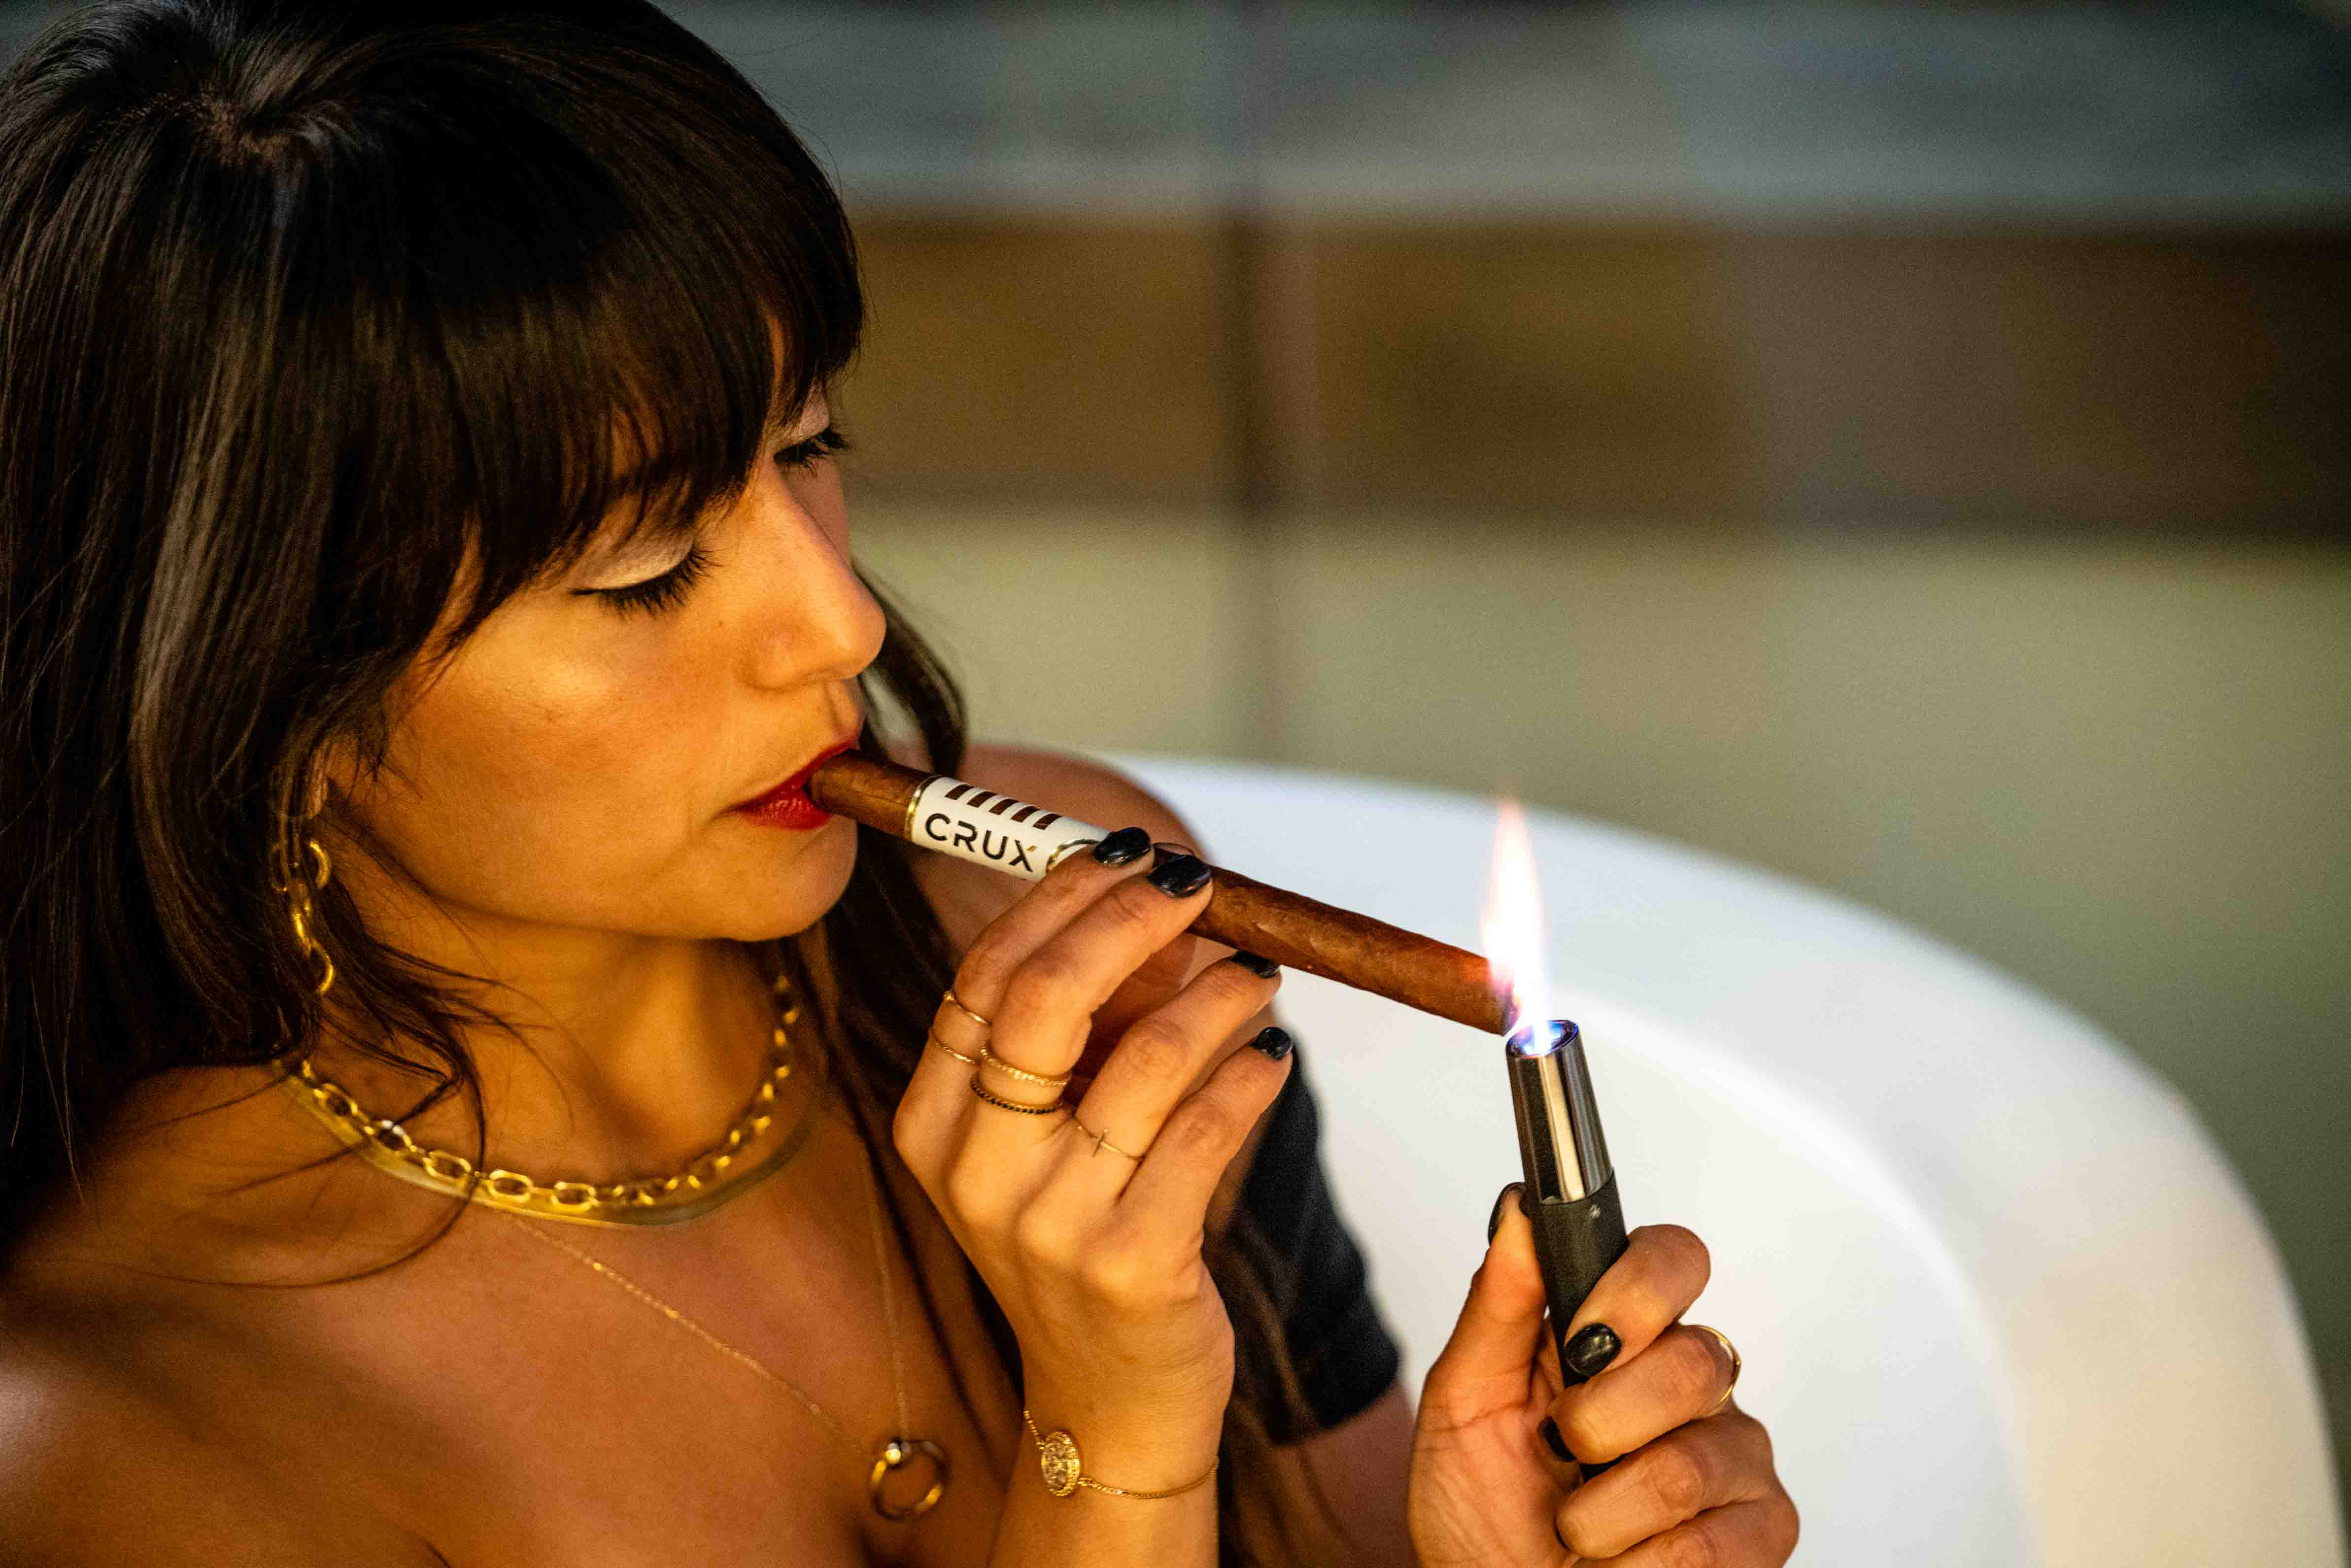 Crux Cigars Relaunches Du Connoisseur in 4 Sizes